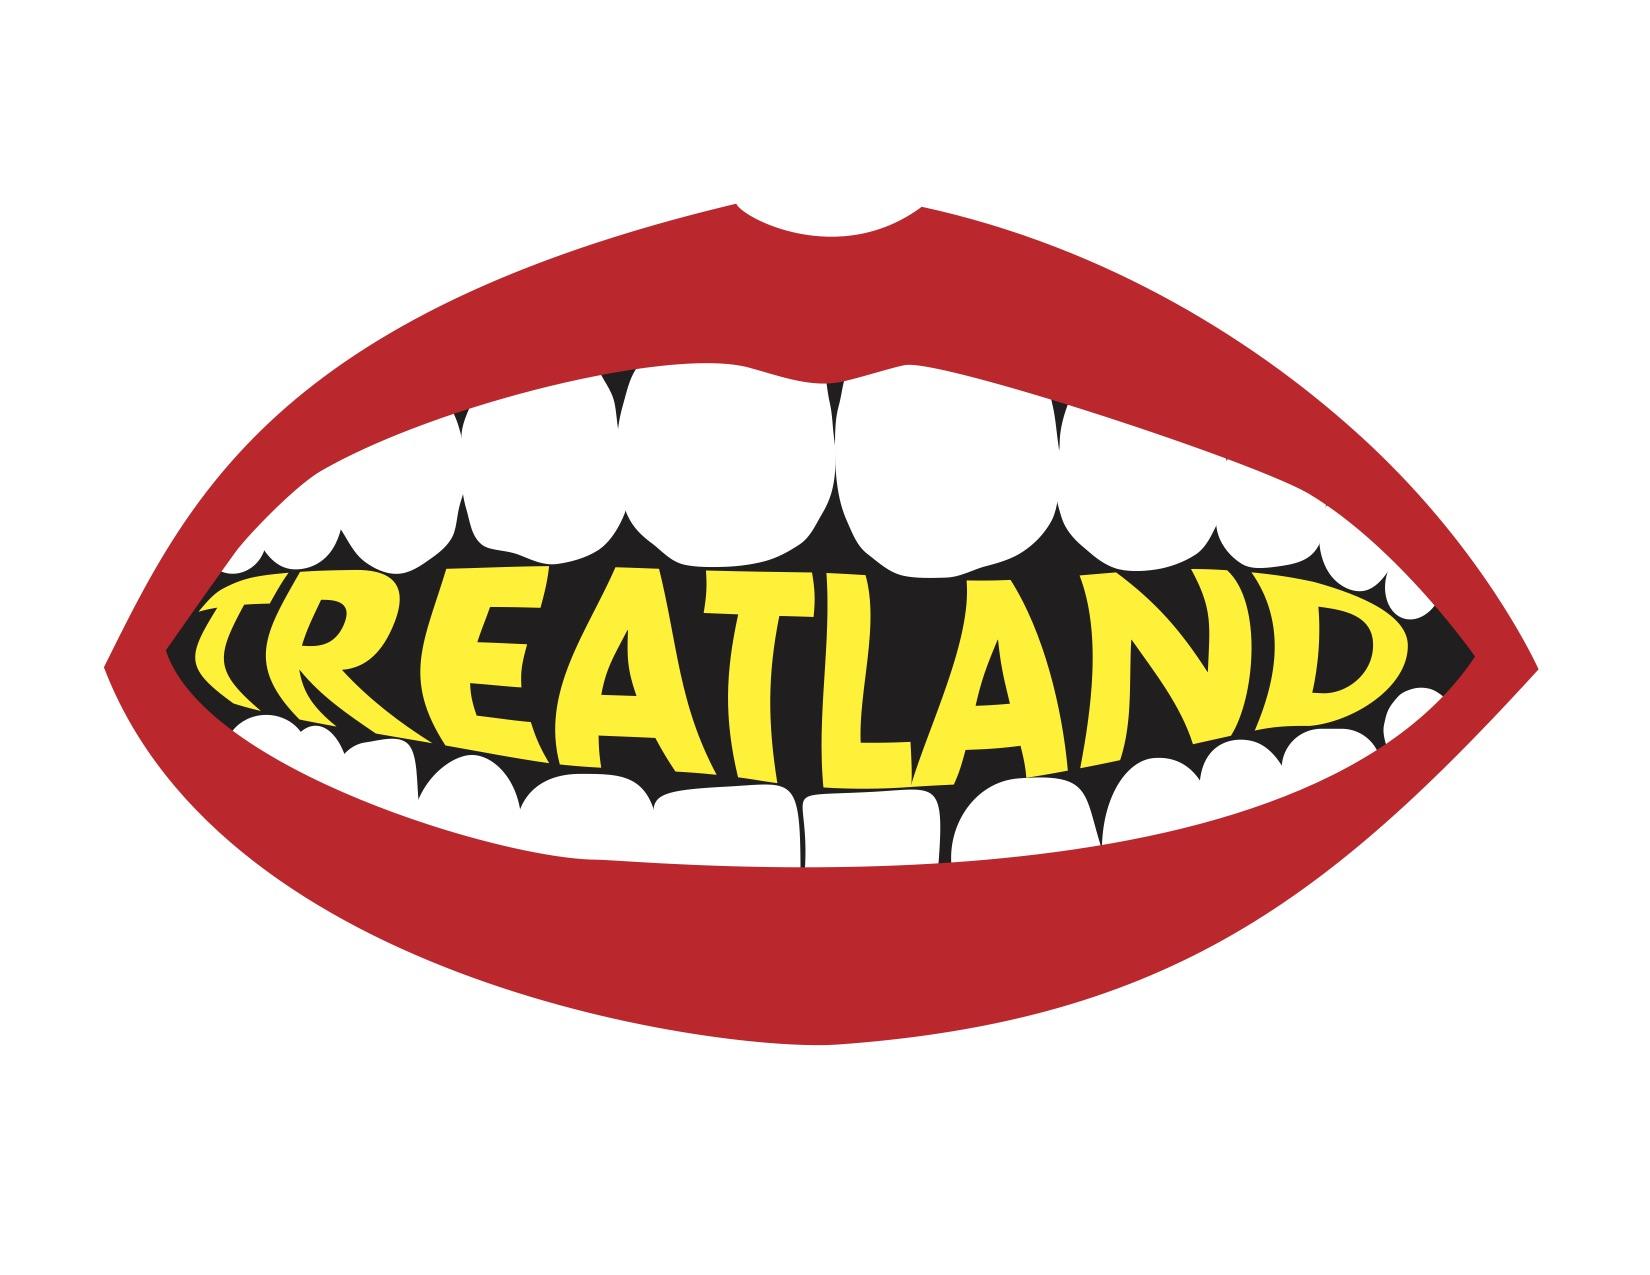 treatland sponsor of moped gp 2019